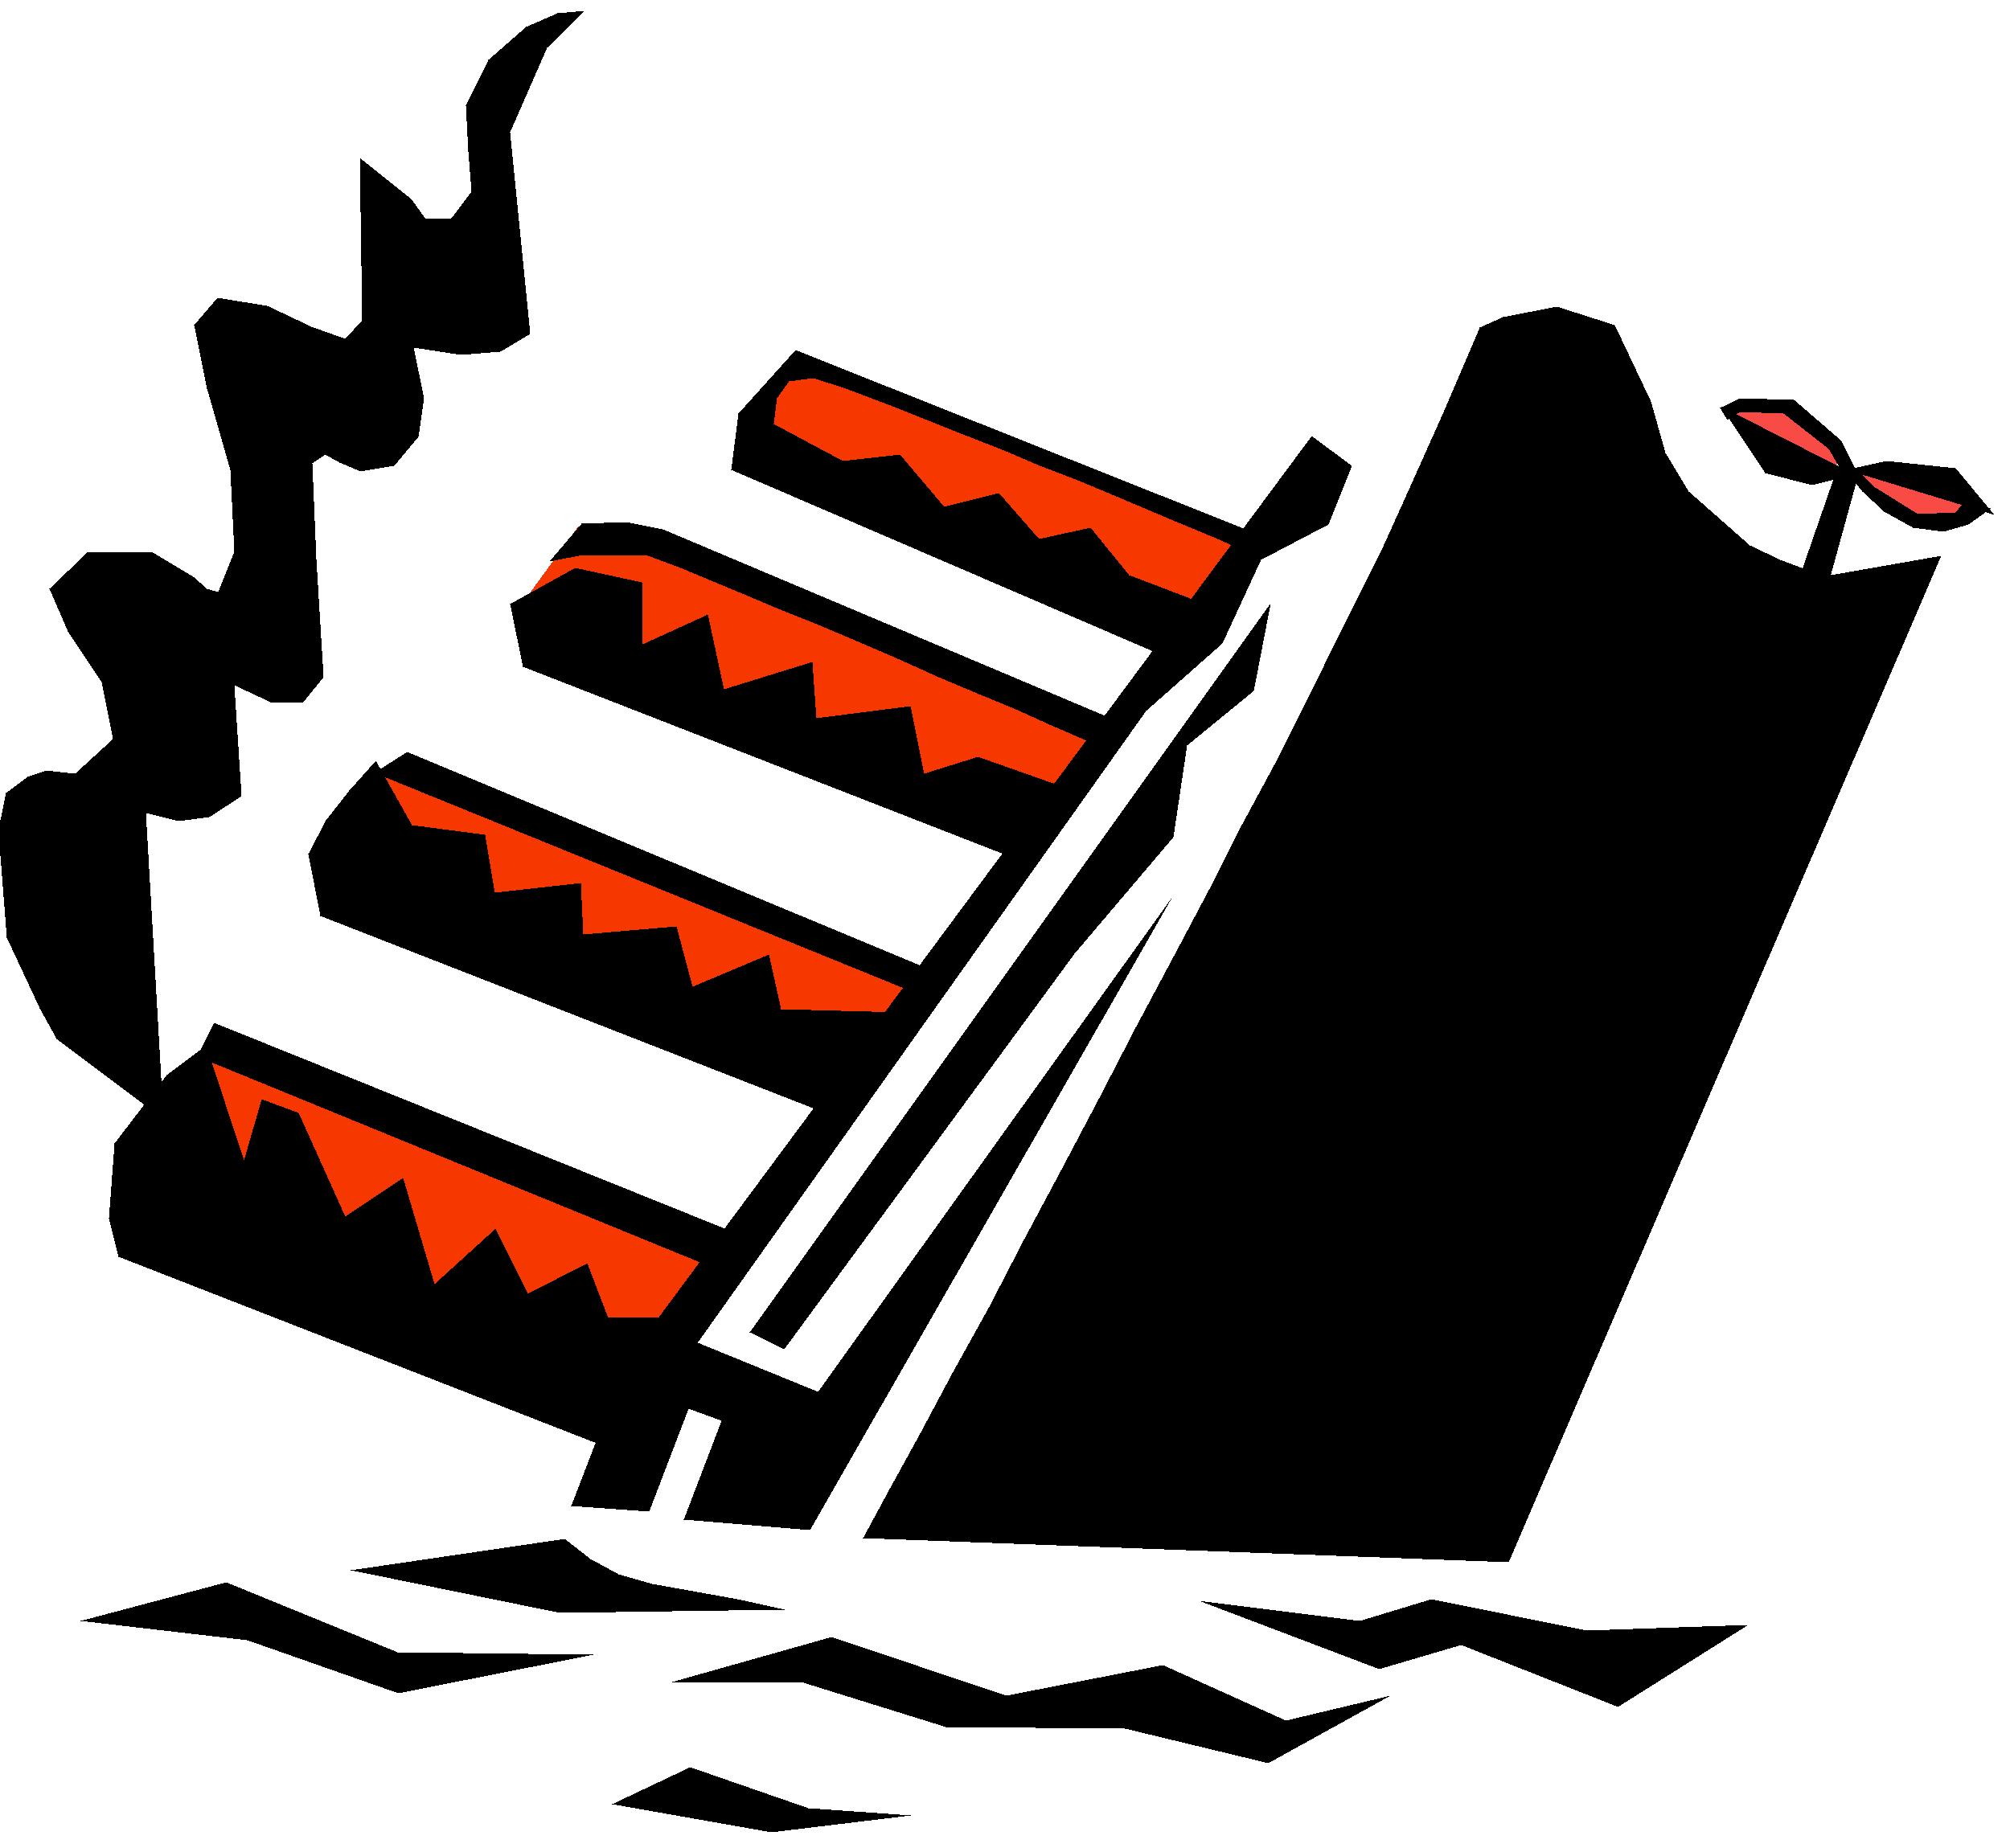 Titanic clipart shipwreck Cliparts Shipwreck Others Titanic and